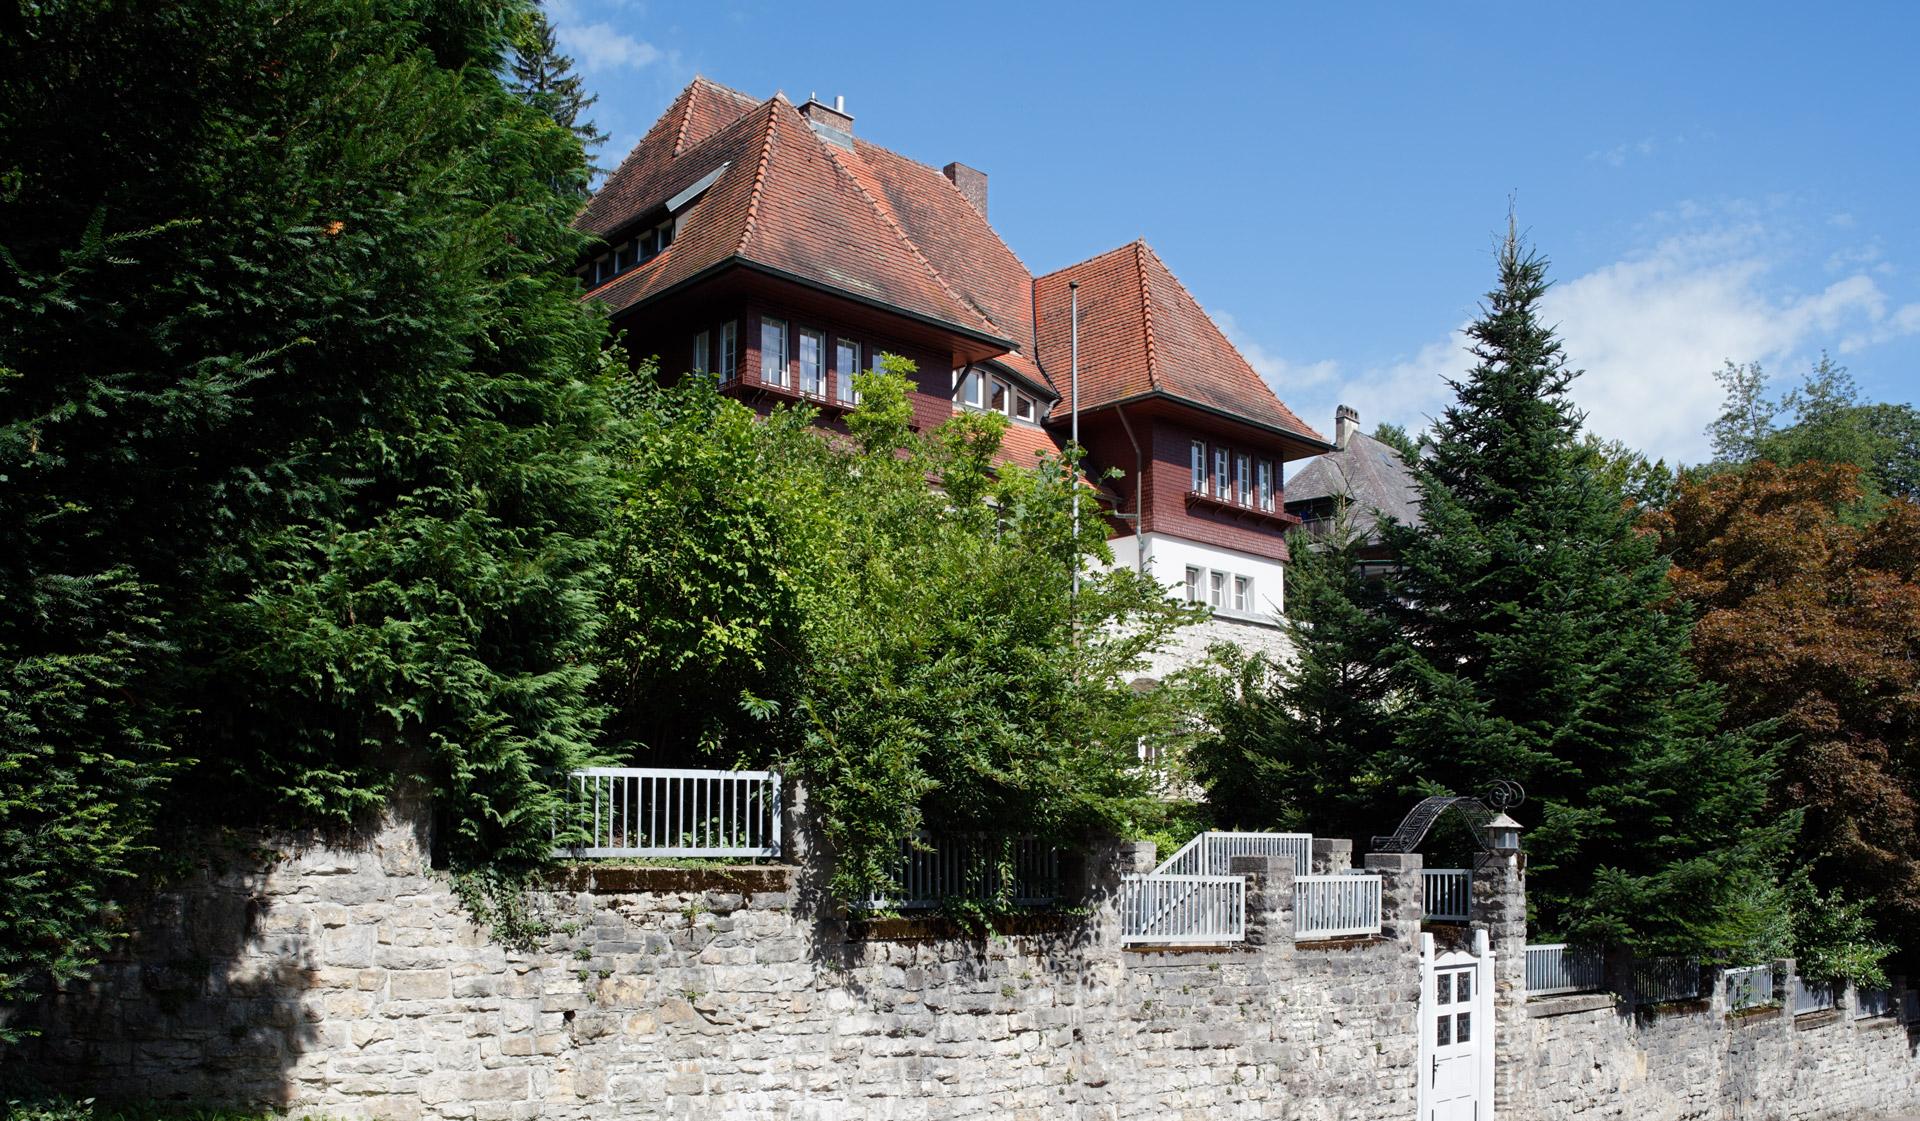 Landhaus Bubat in Freiburg Weber Hummel Architekten 1